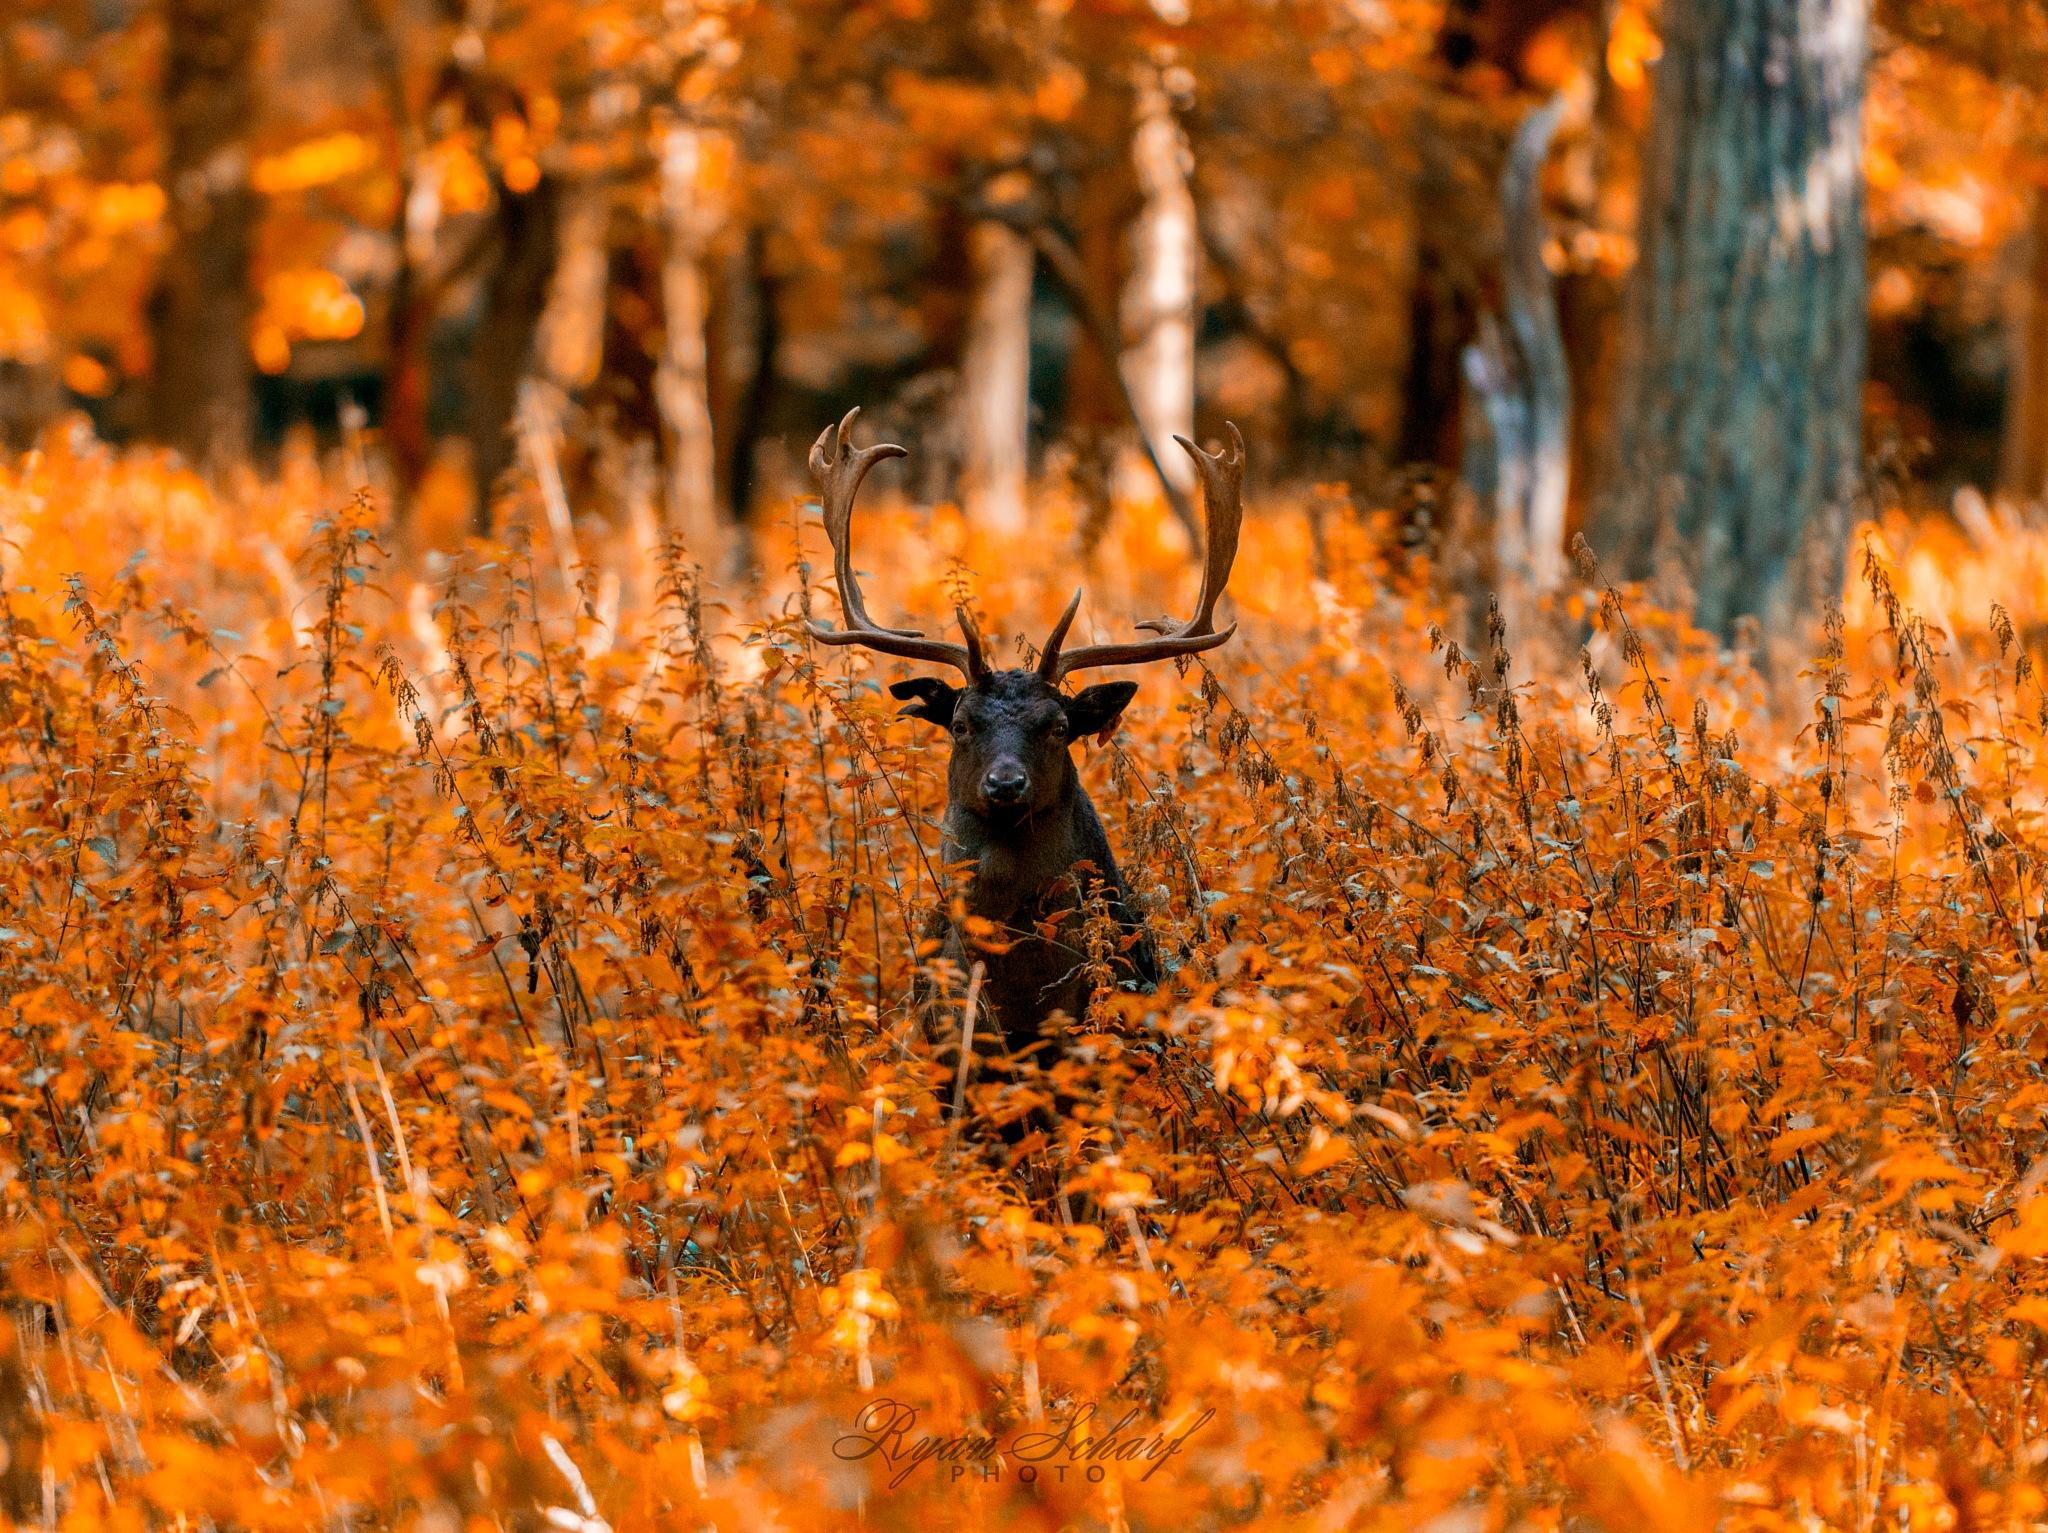 Deer in colors of autumn by Erős Rezső